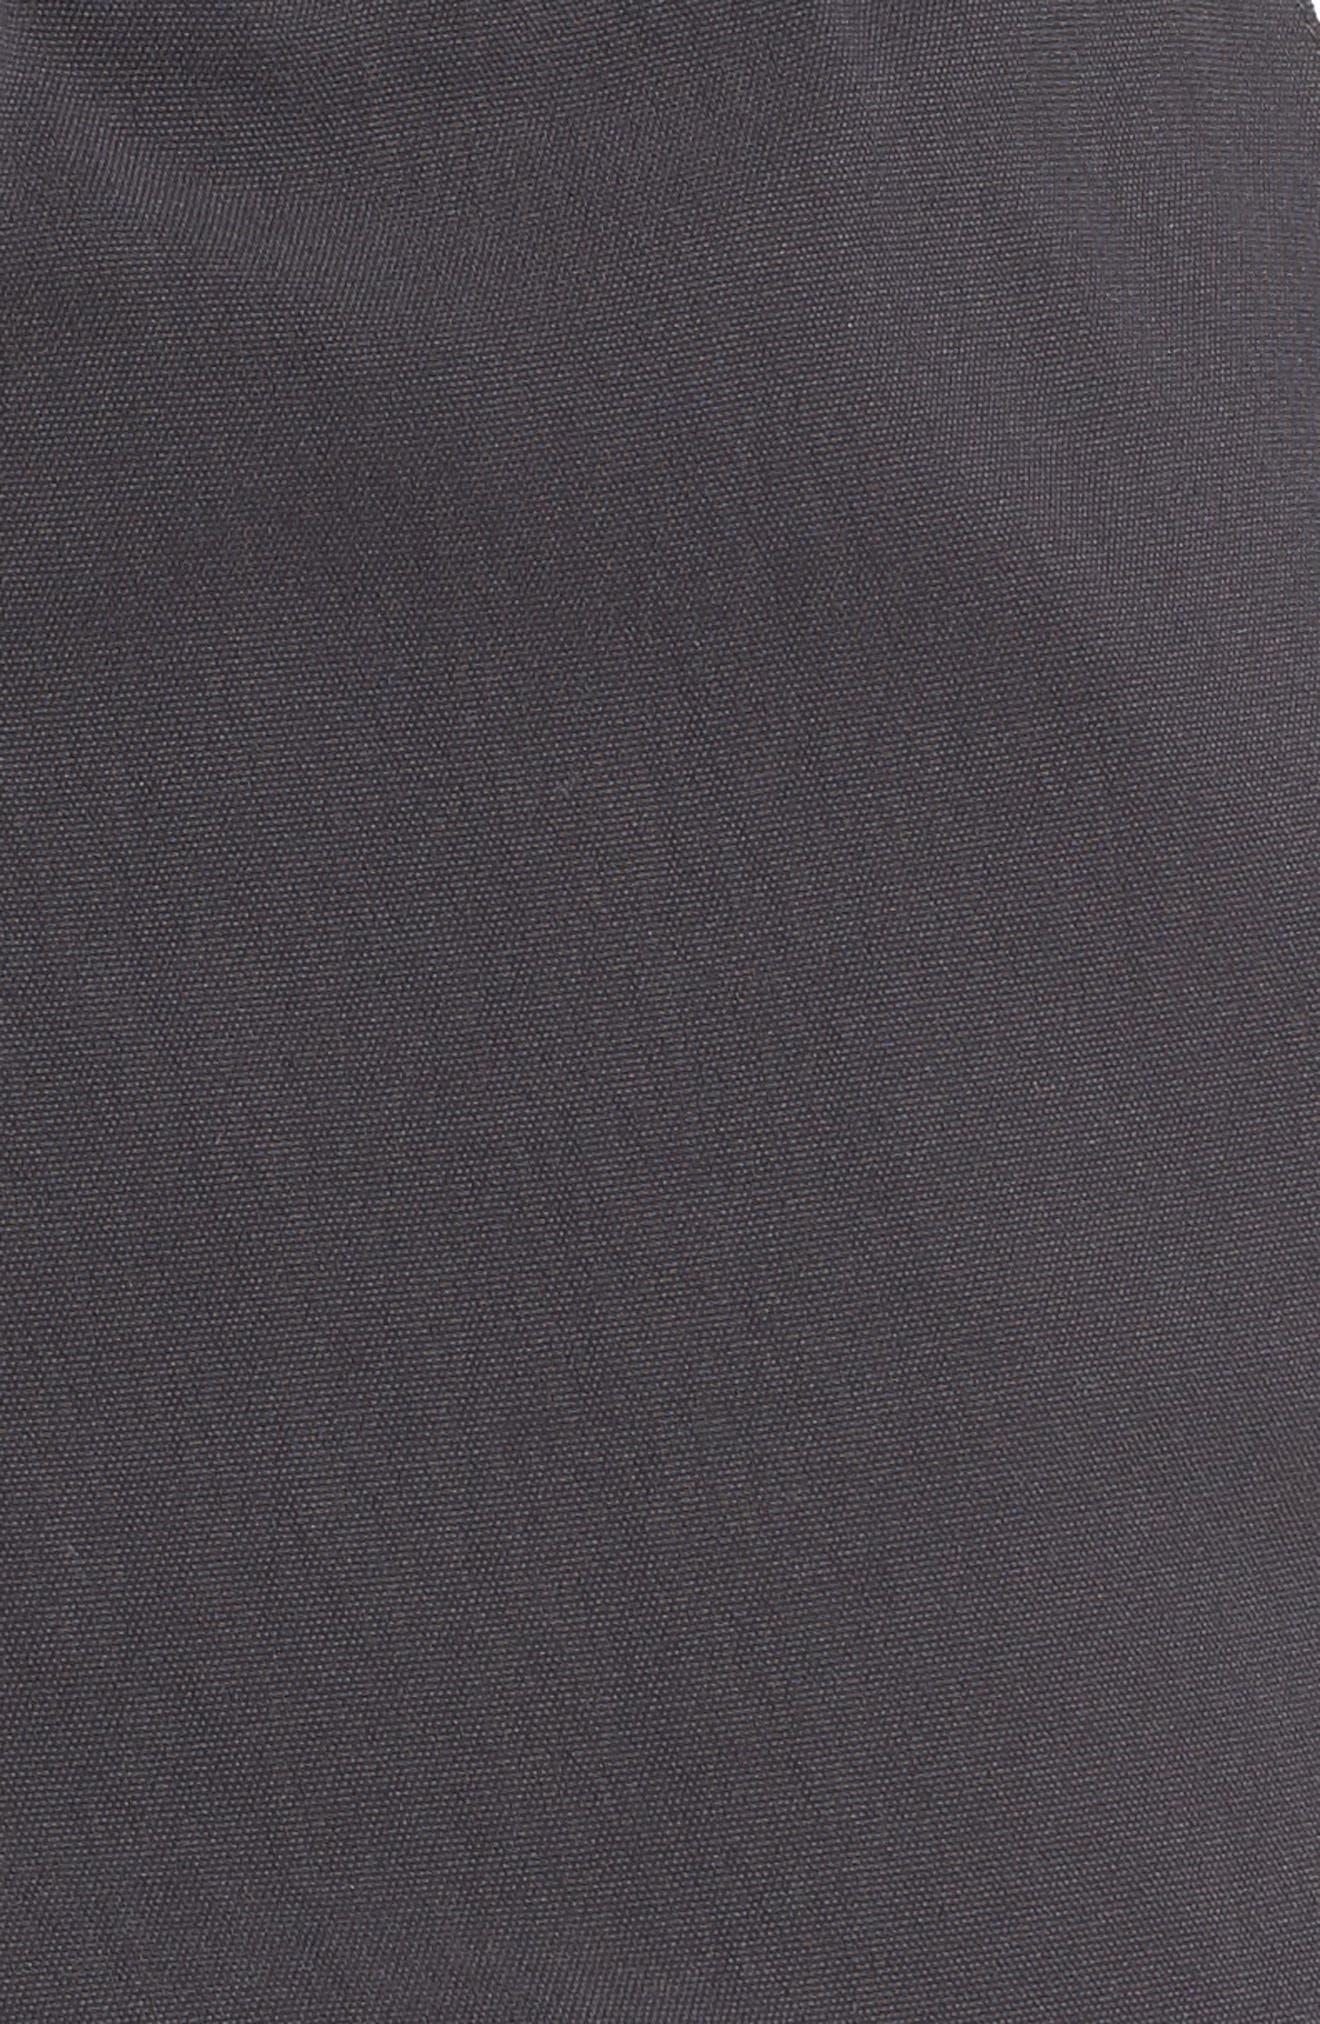 Planes Pants,                             Alternate thumbnail 5, color,                             Vintage Black/ Vintage Black